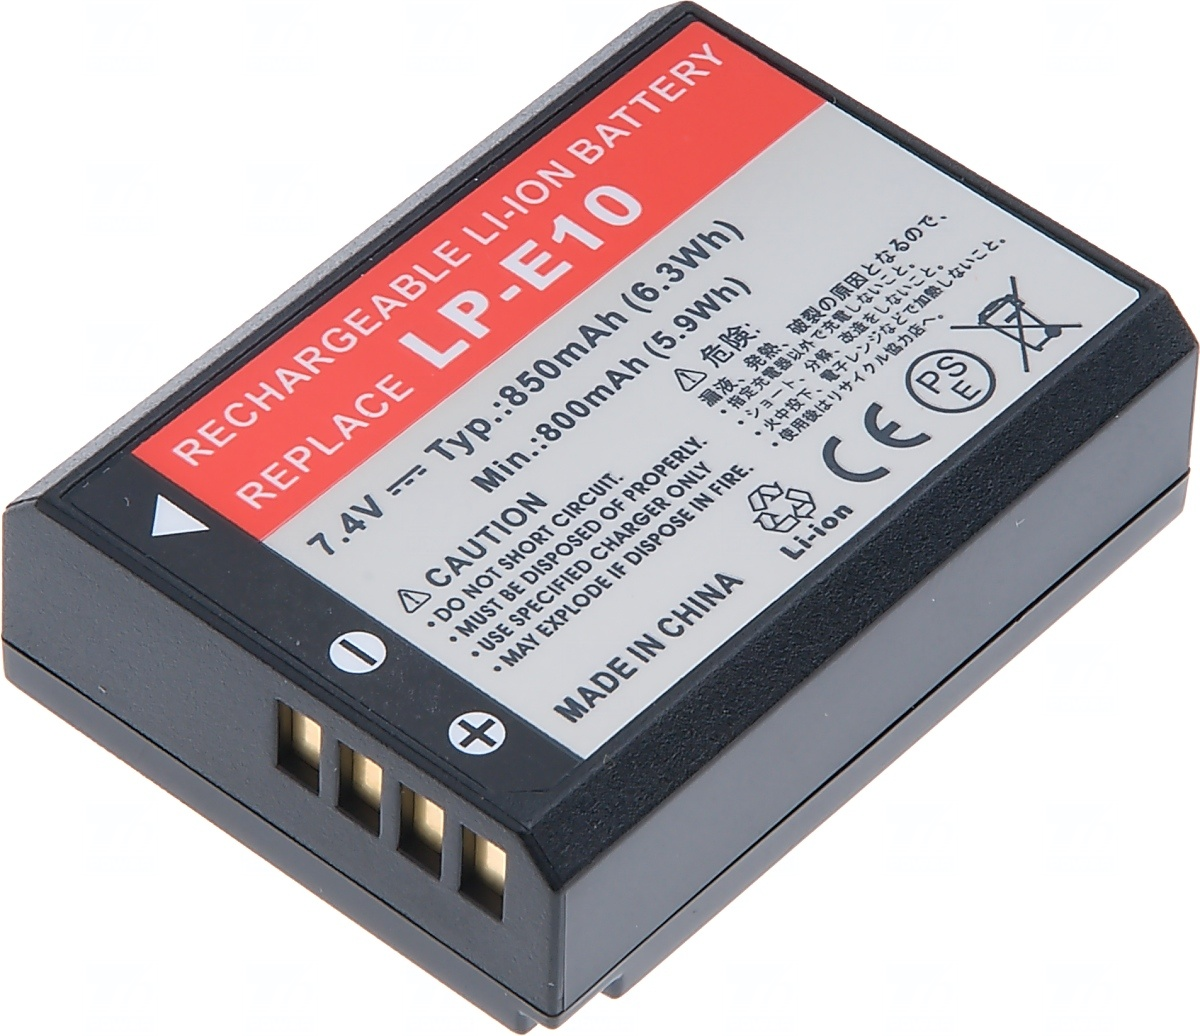 Baterie T6 power Canon LP-E10, 1050mAh, 7, 8Wh, černá